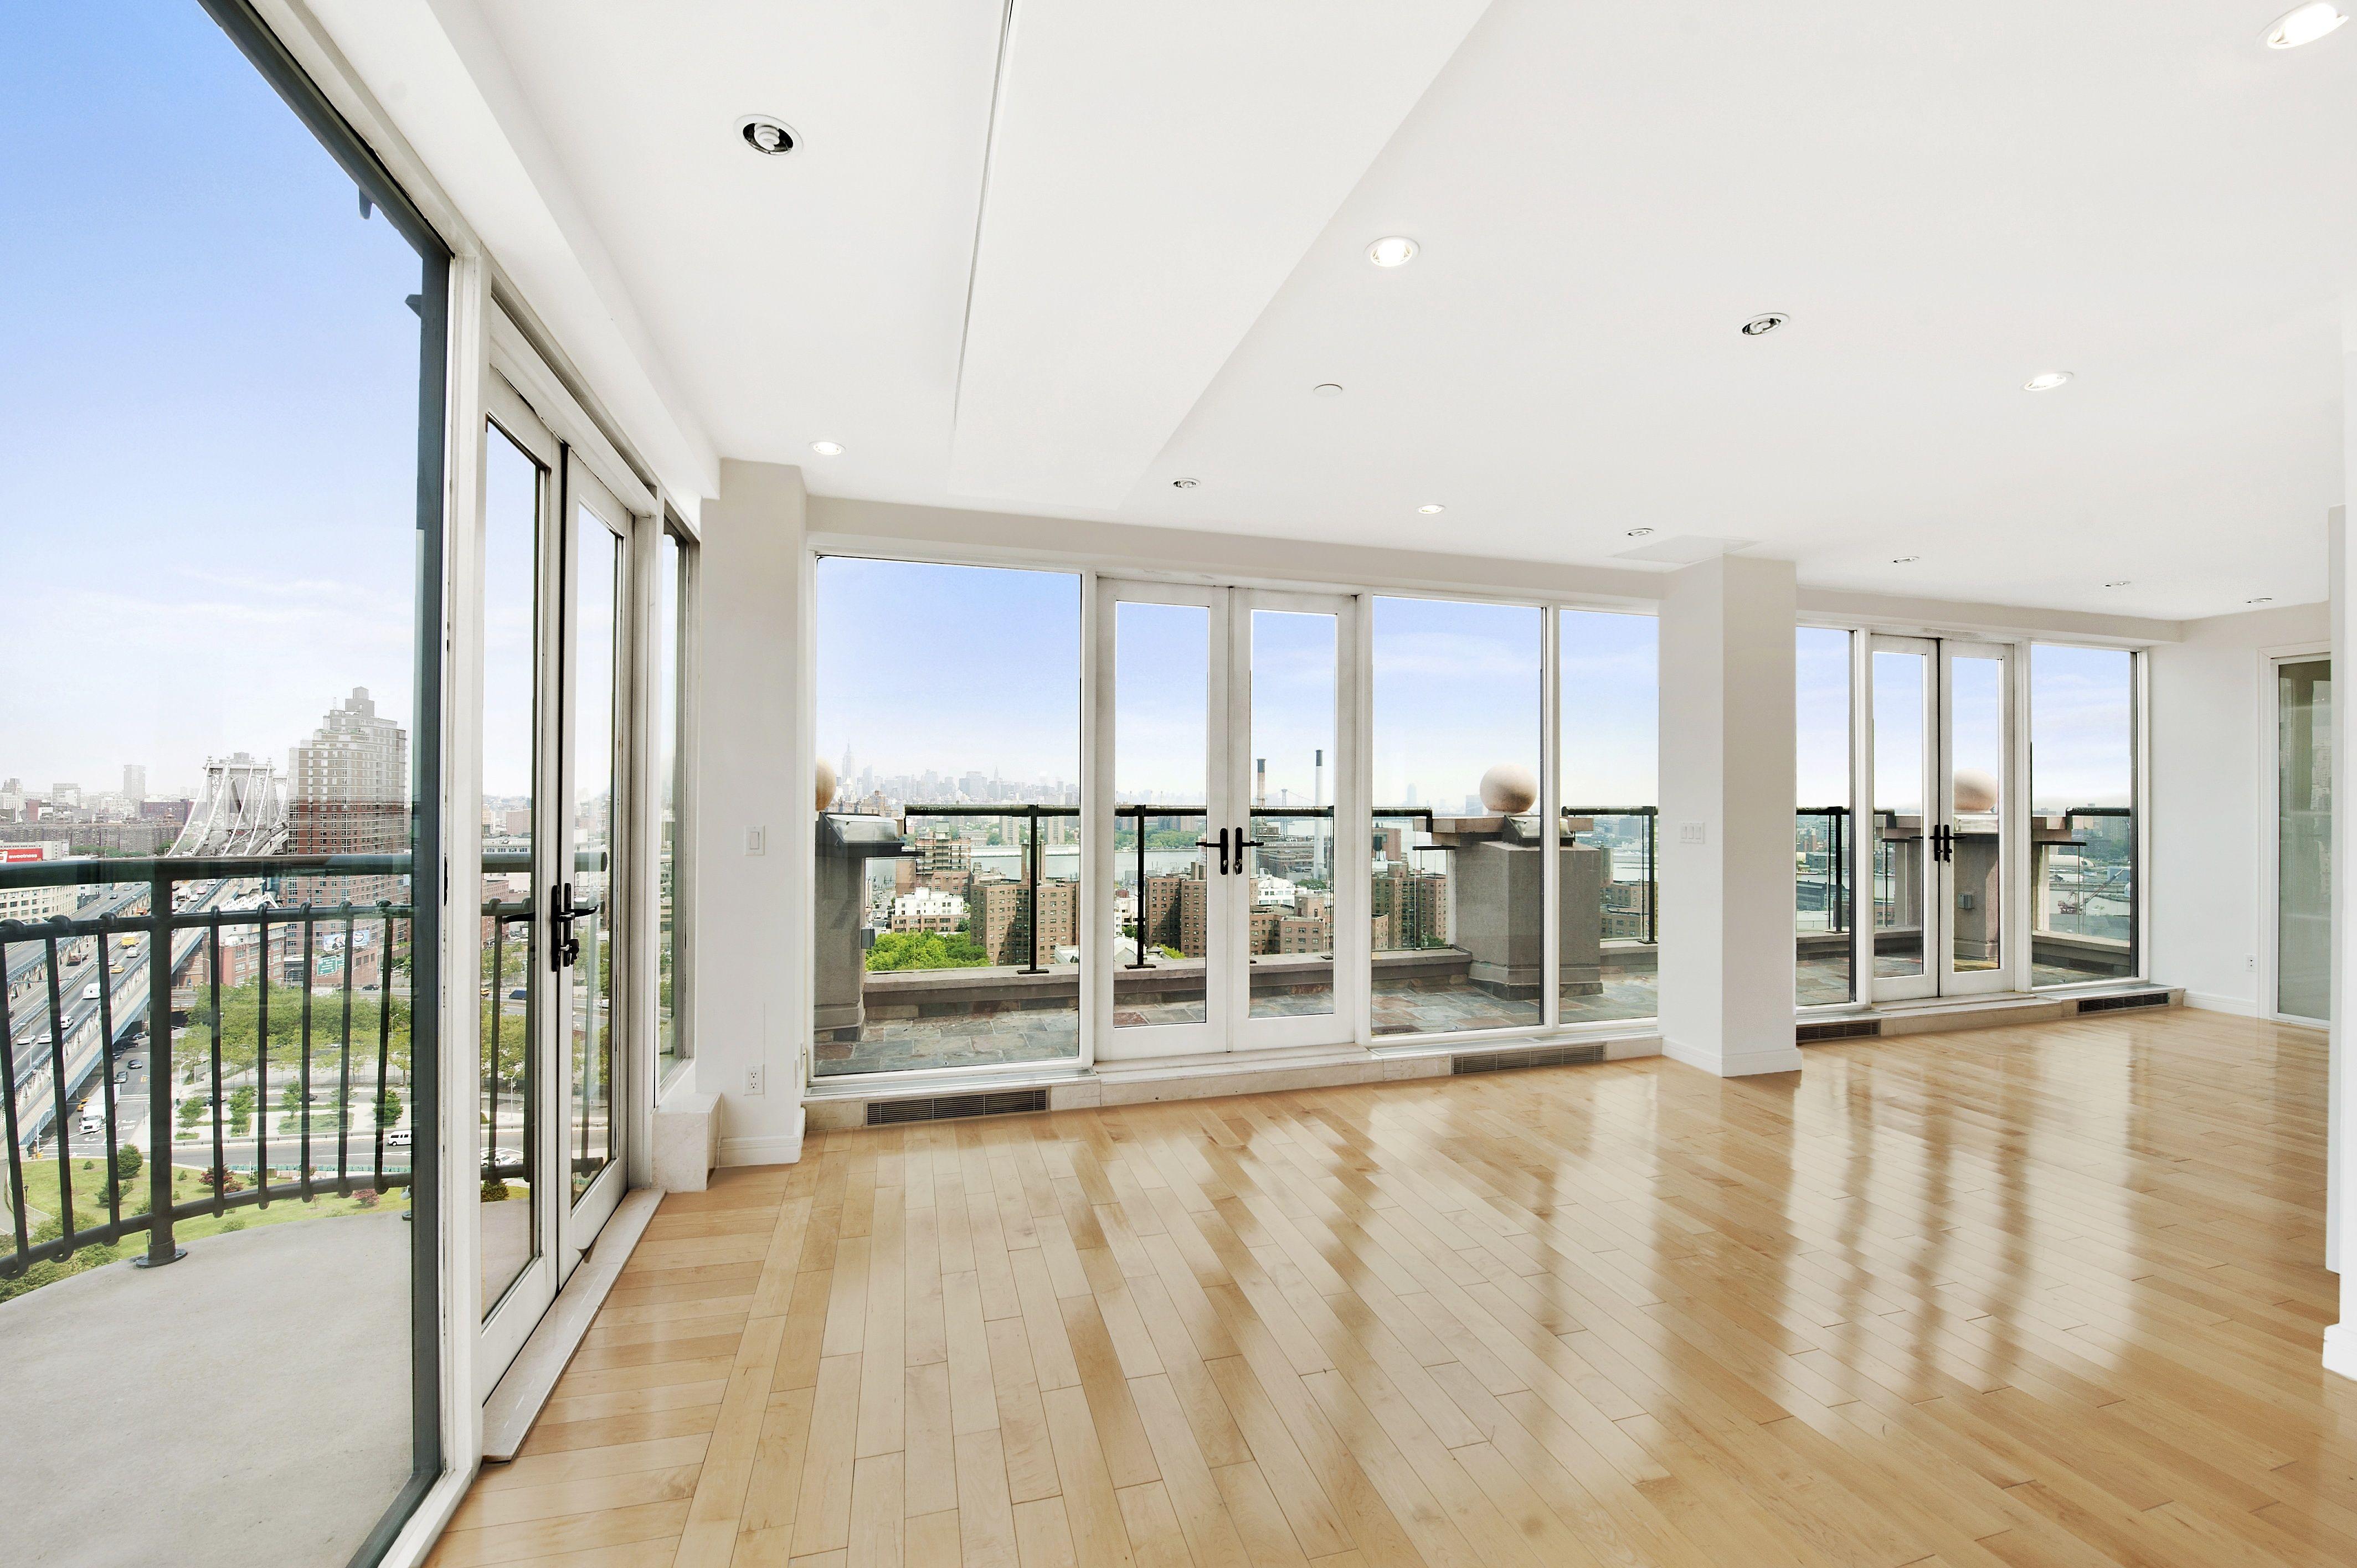 downtown brooklyn glass duplex penthouse stunner 5 br for sale